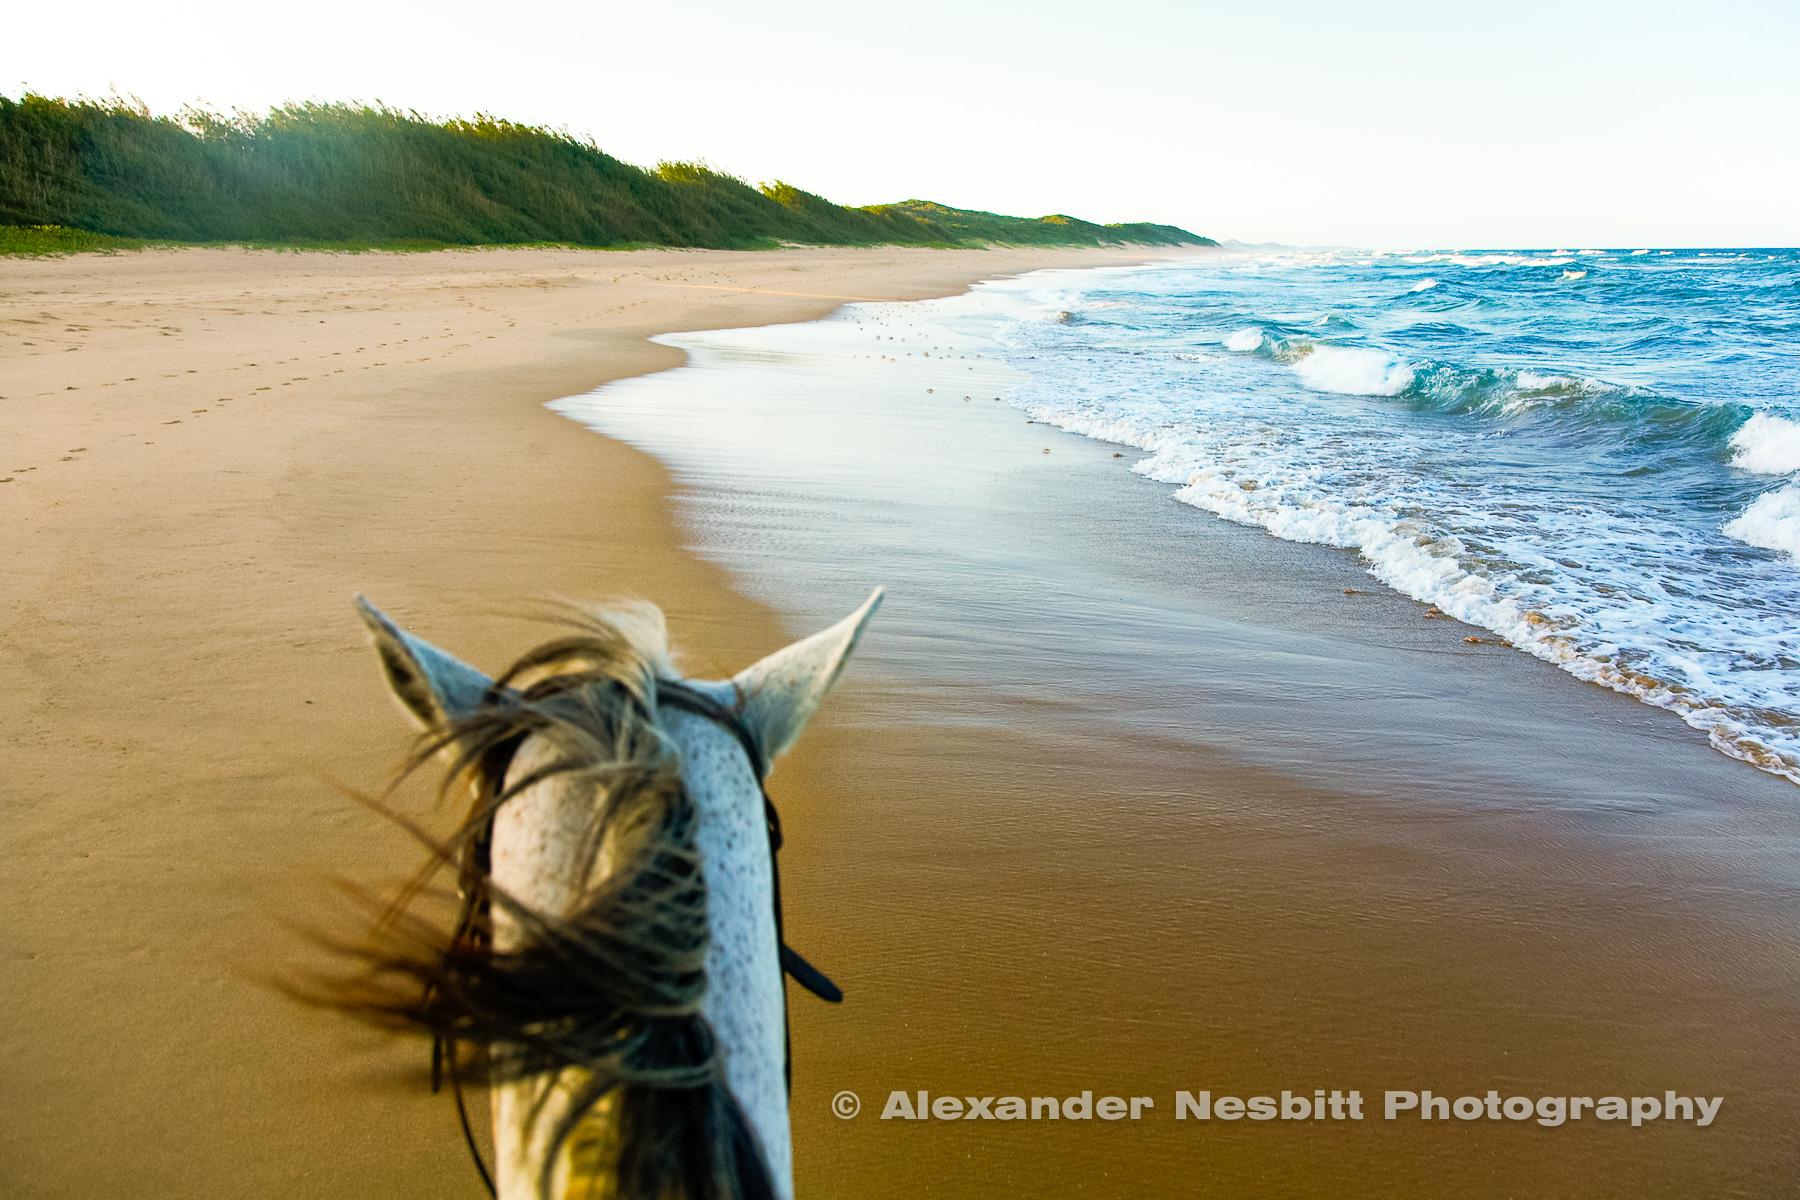 Riding the beach on horseback